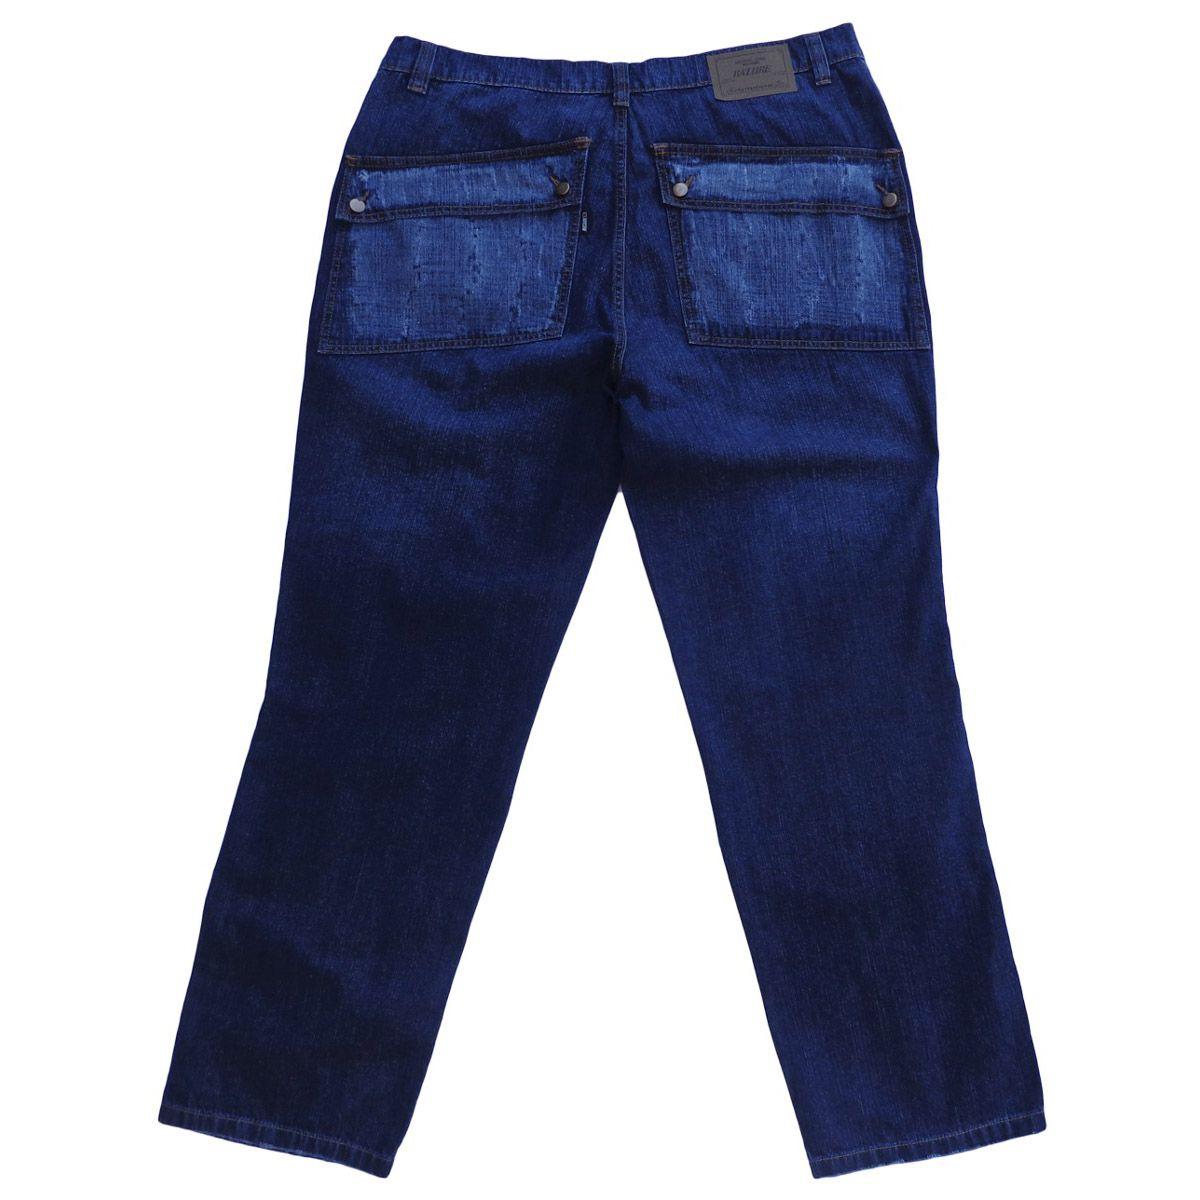 Calça Jeans Masculina Cargo Plus Size